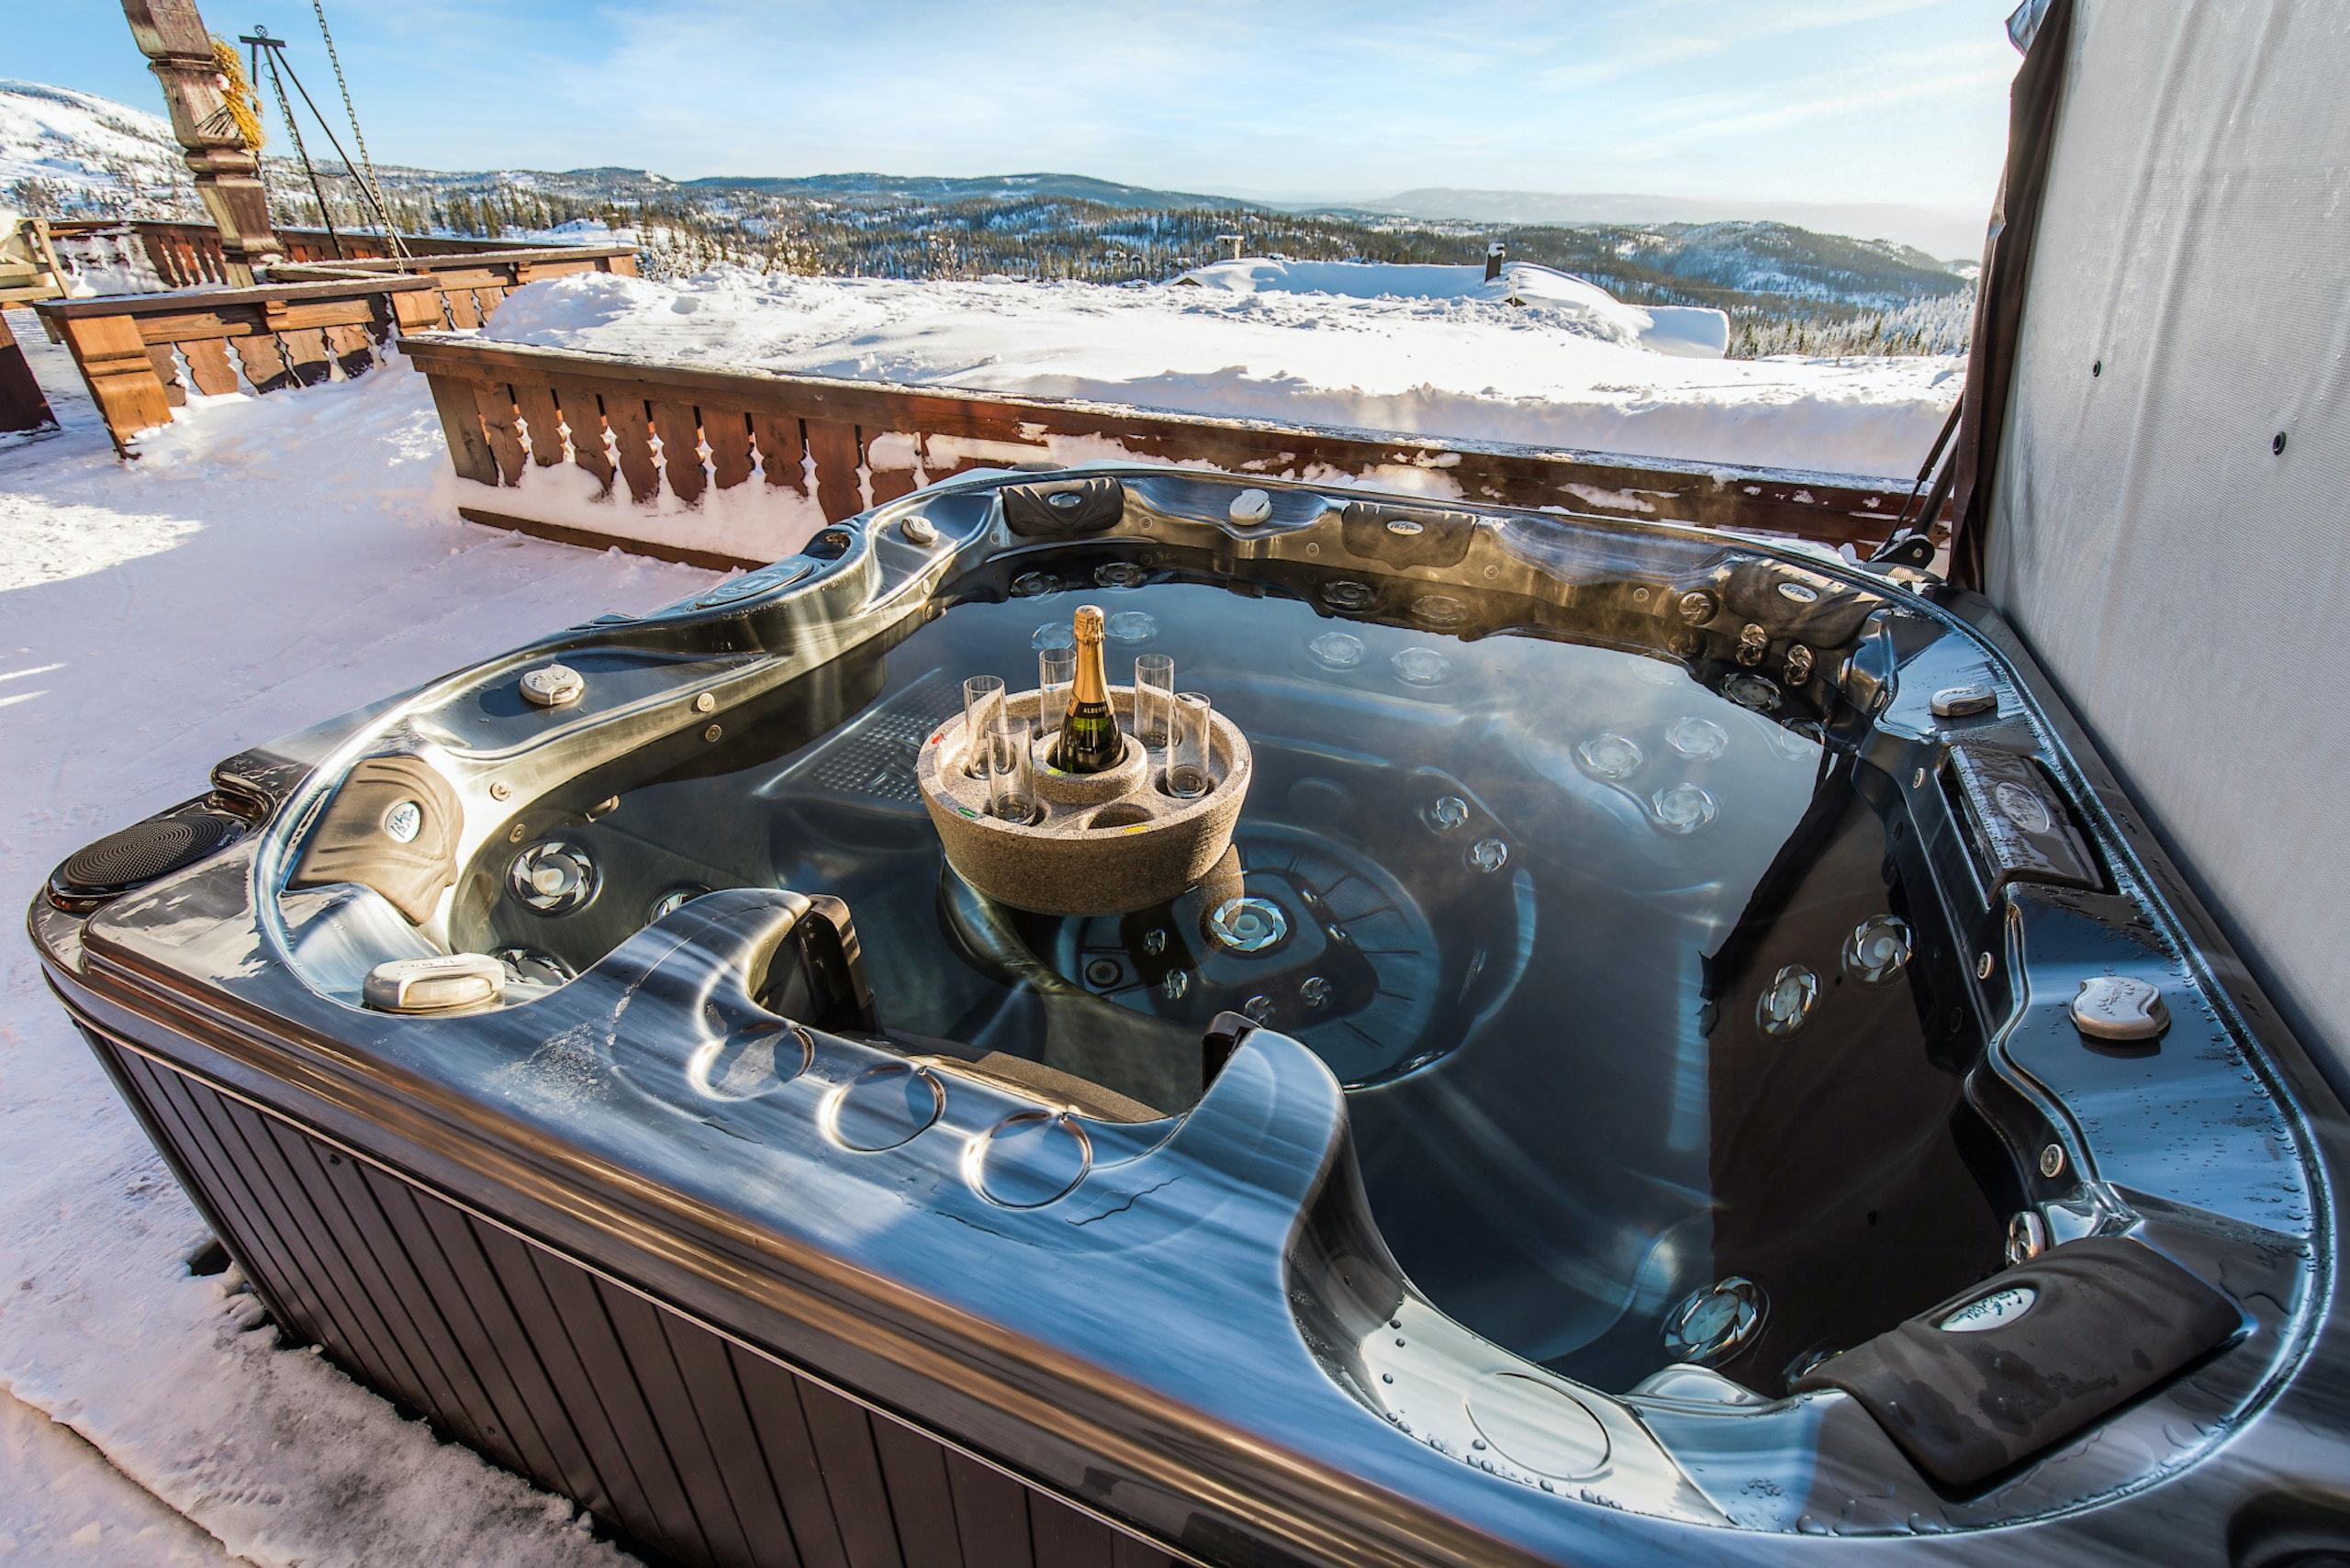 Whirlpool varmtvandsbereder dating